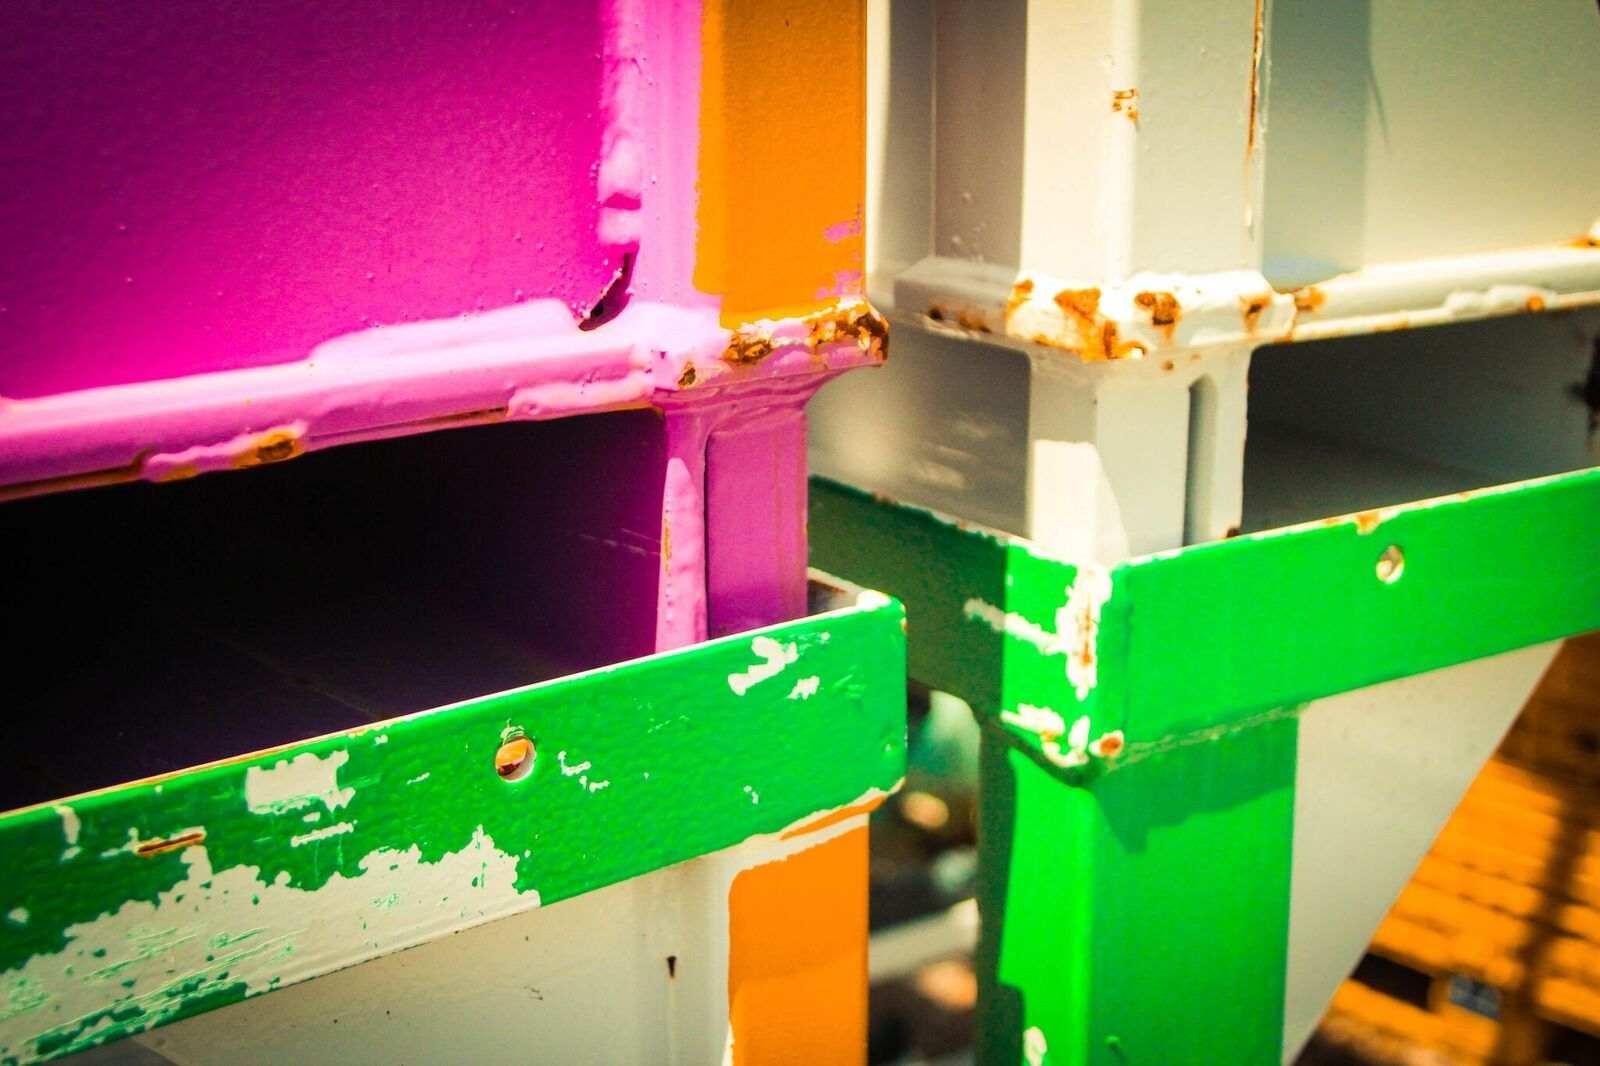 Colorful Steel racks